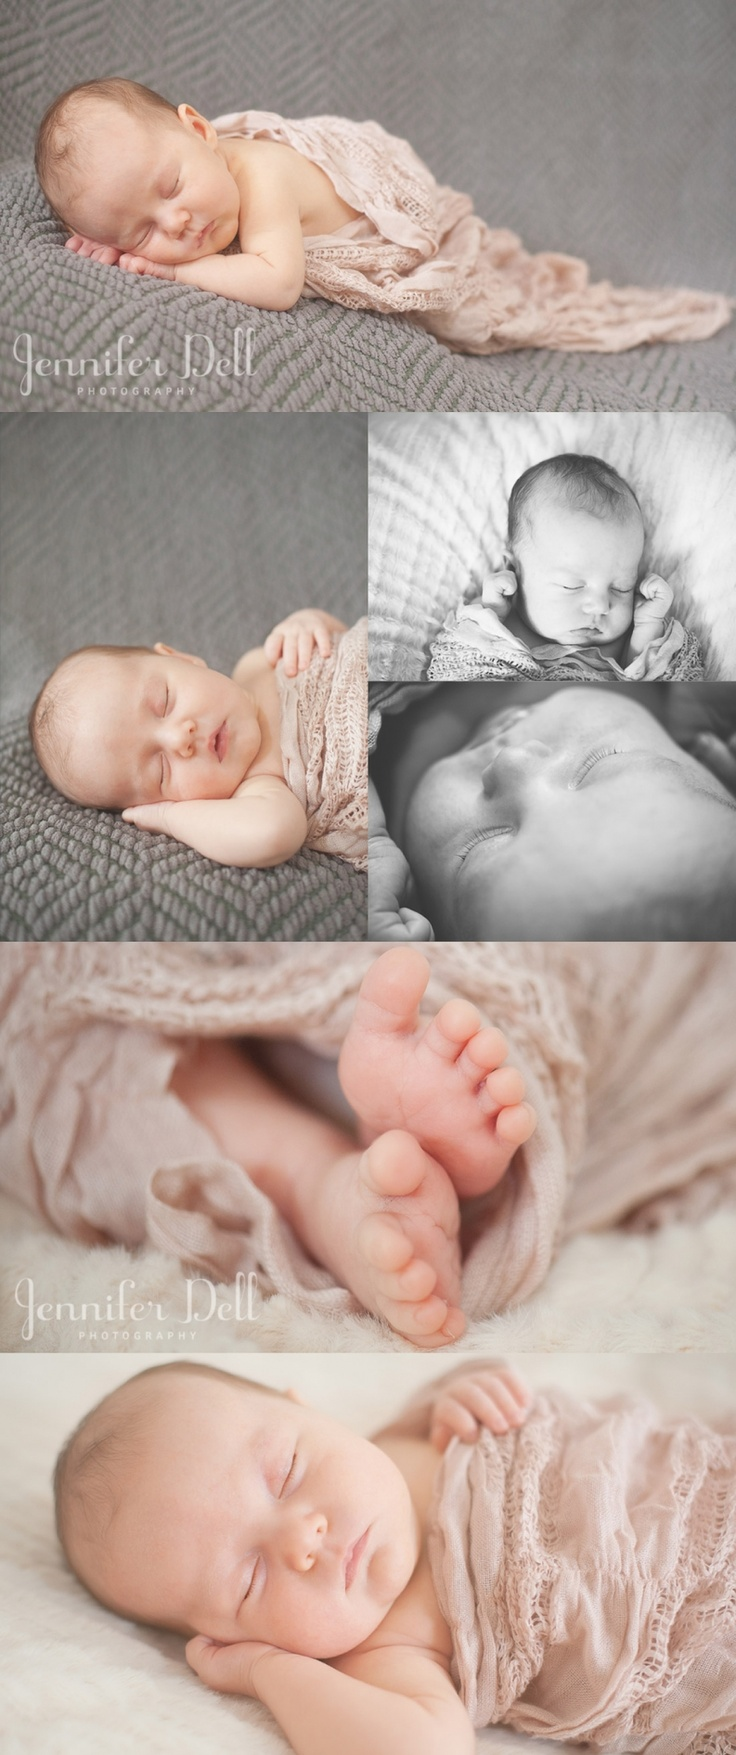 newborn photography studio in houston tax